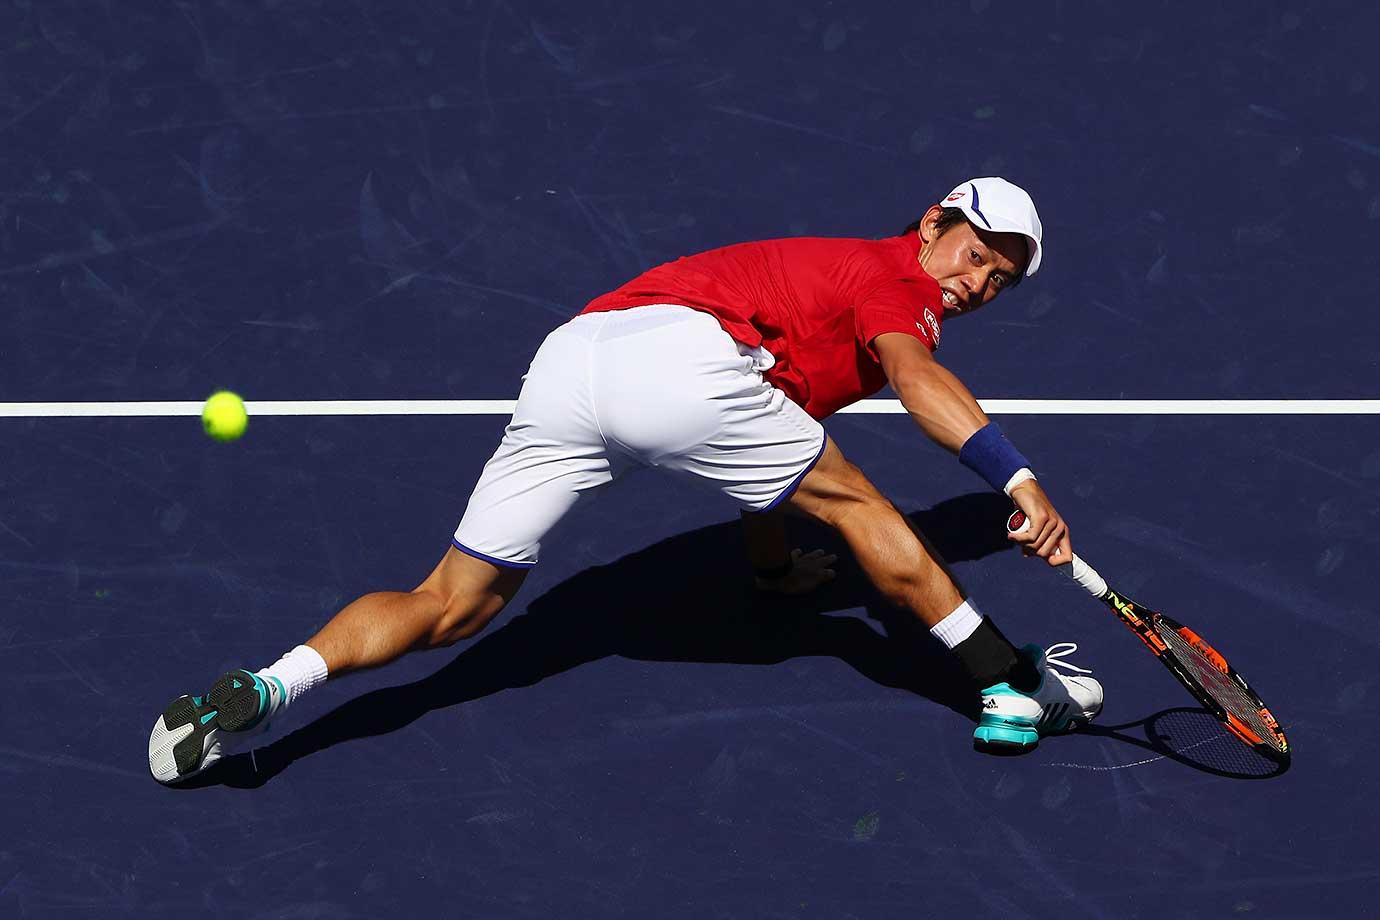 Kei Nishikori of Japan in action in his match against Rafael Nadal of Spain.